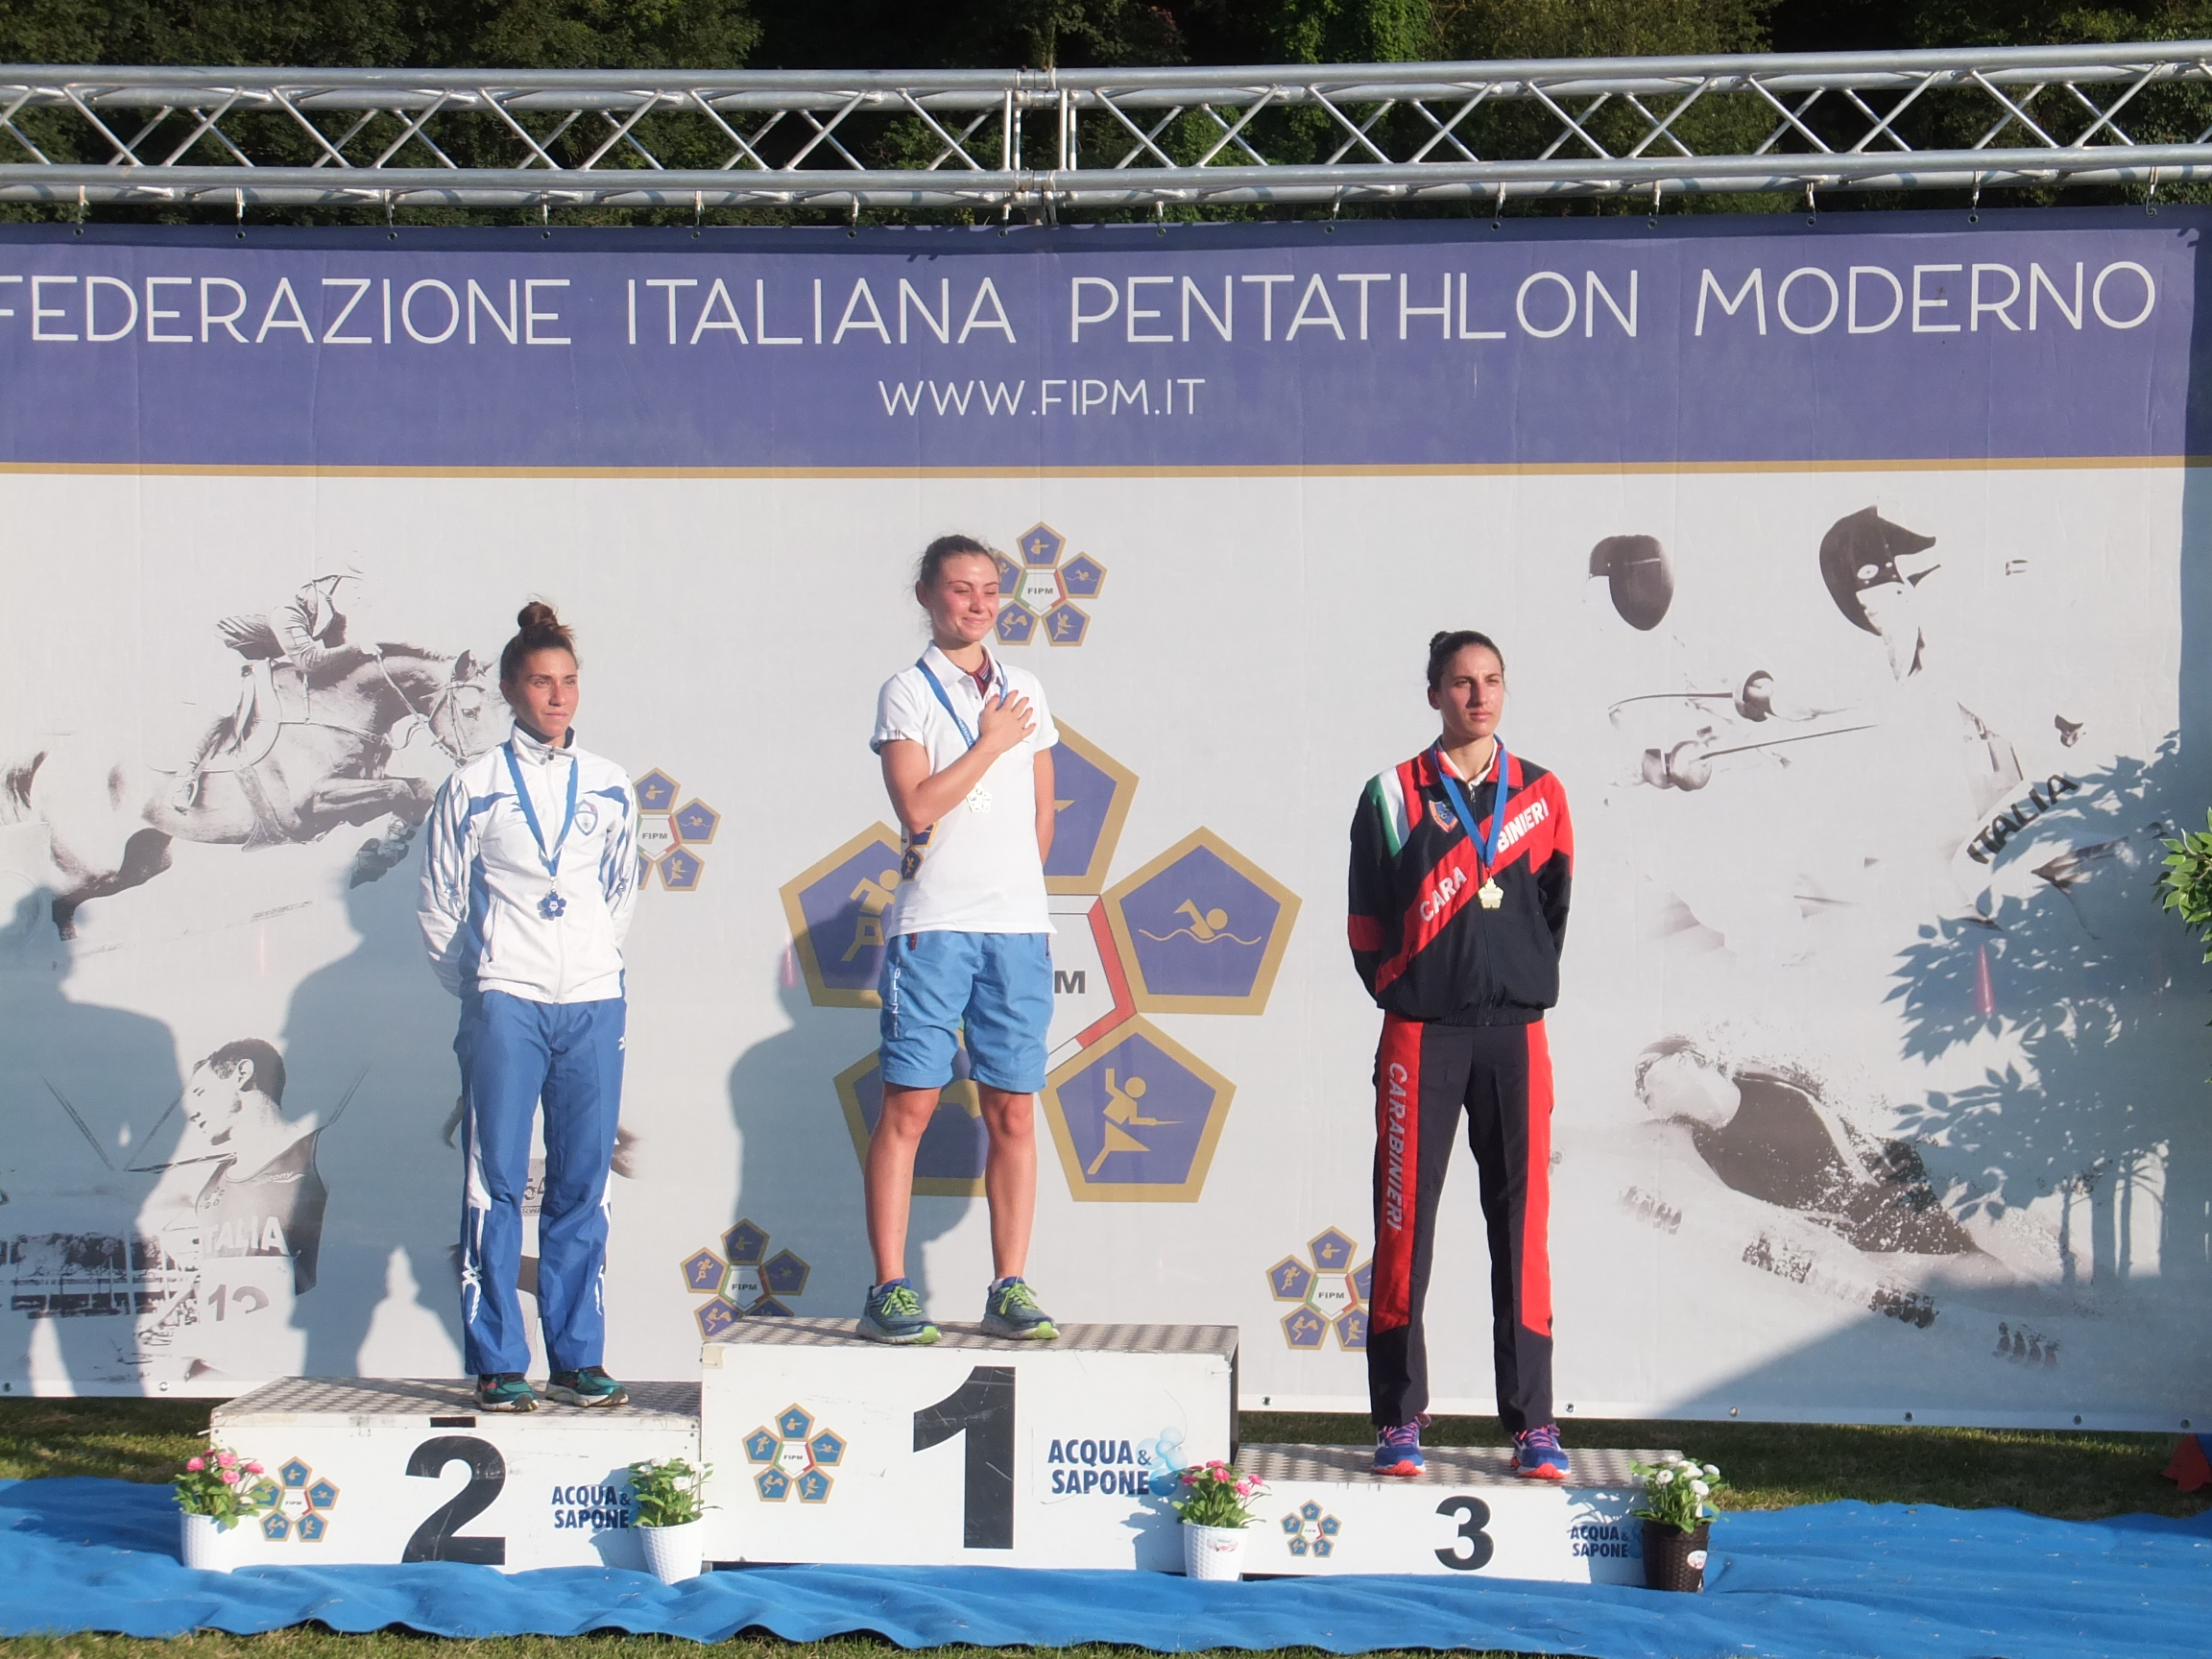 pentathlon campionato italiano assoluto 2018 podio femminile irene prampolini alice sotero elena micheli italia pentathlon moderno modern pentathlon italy